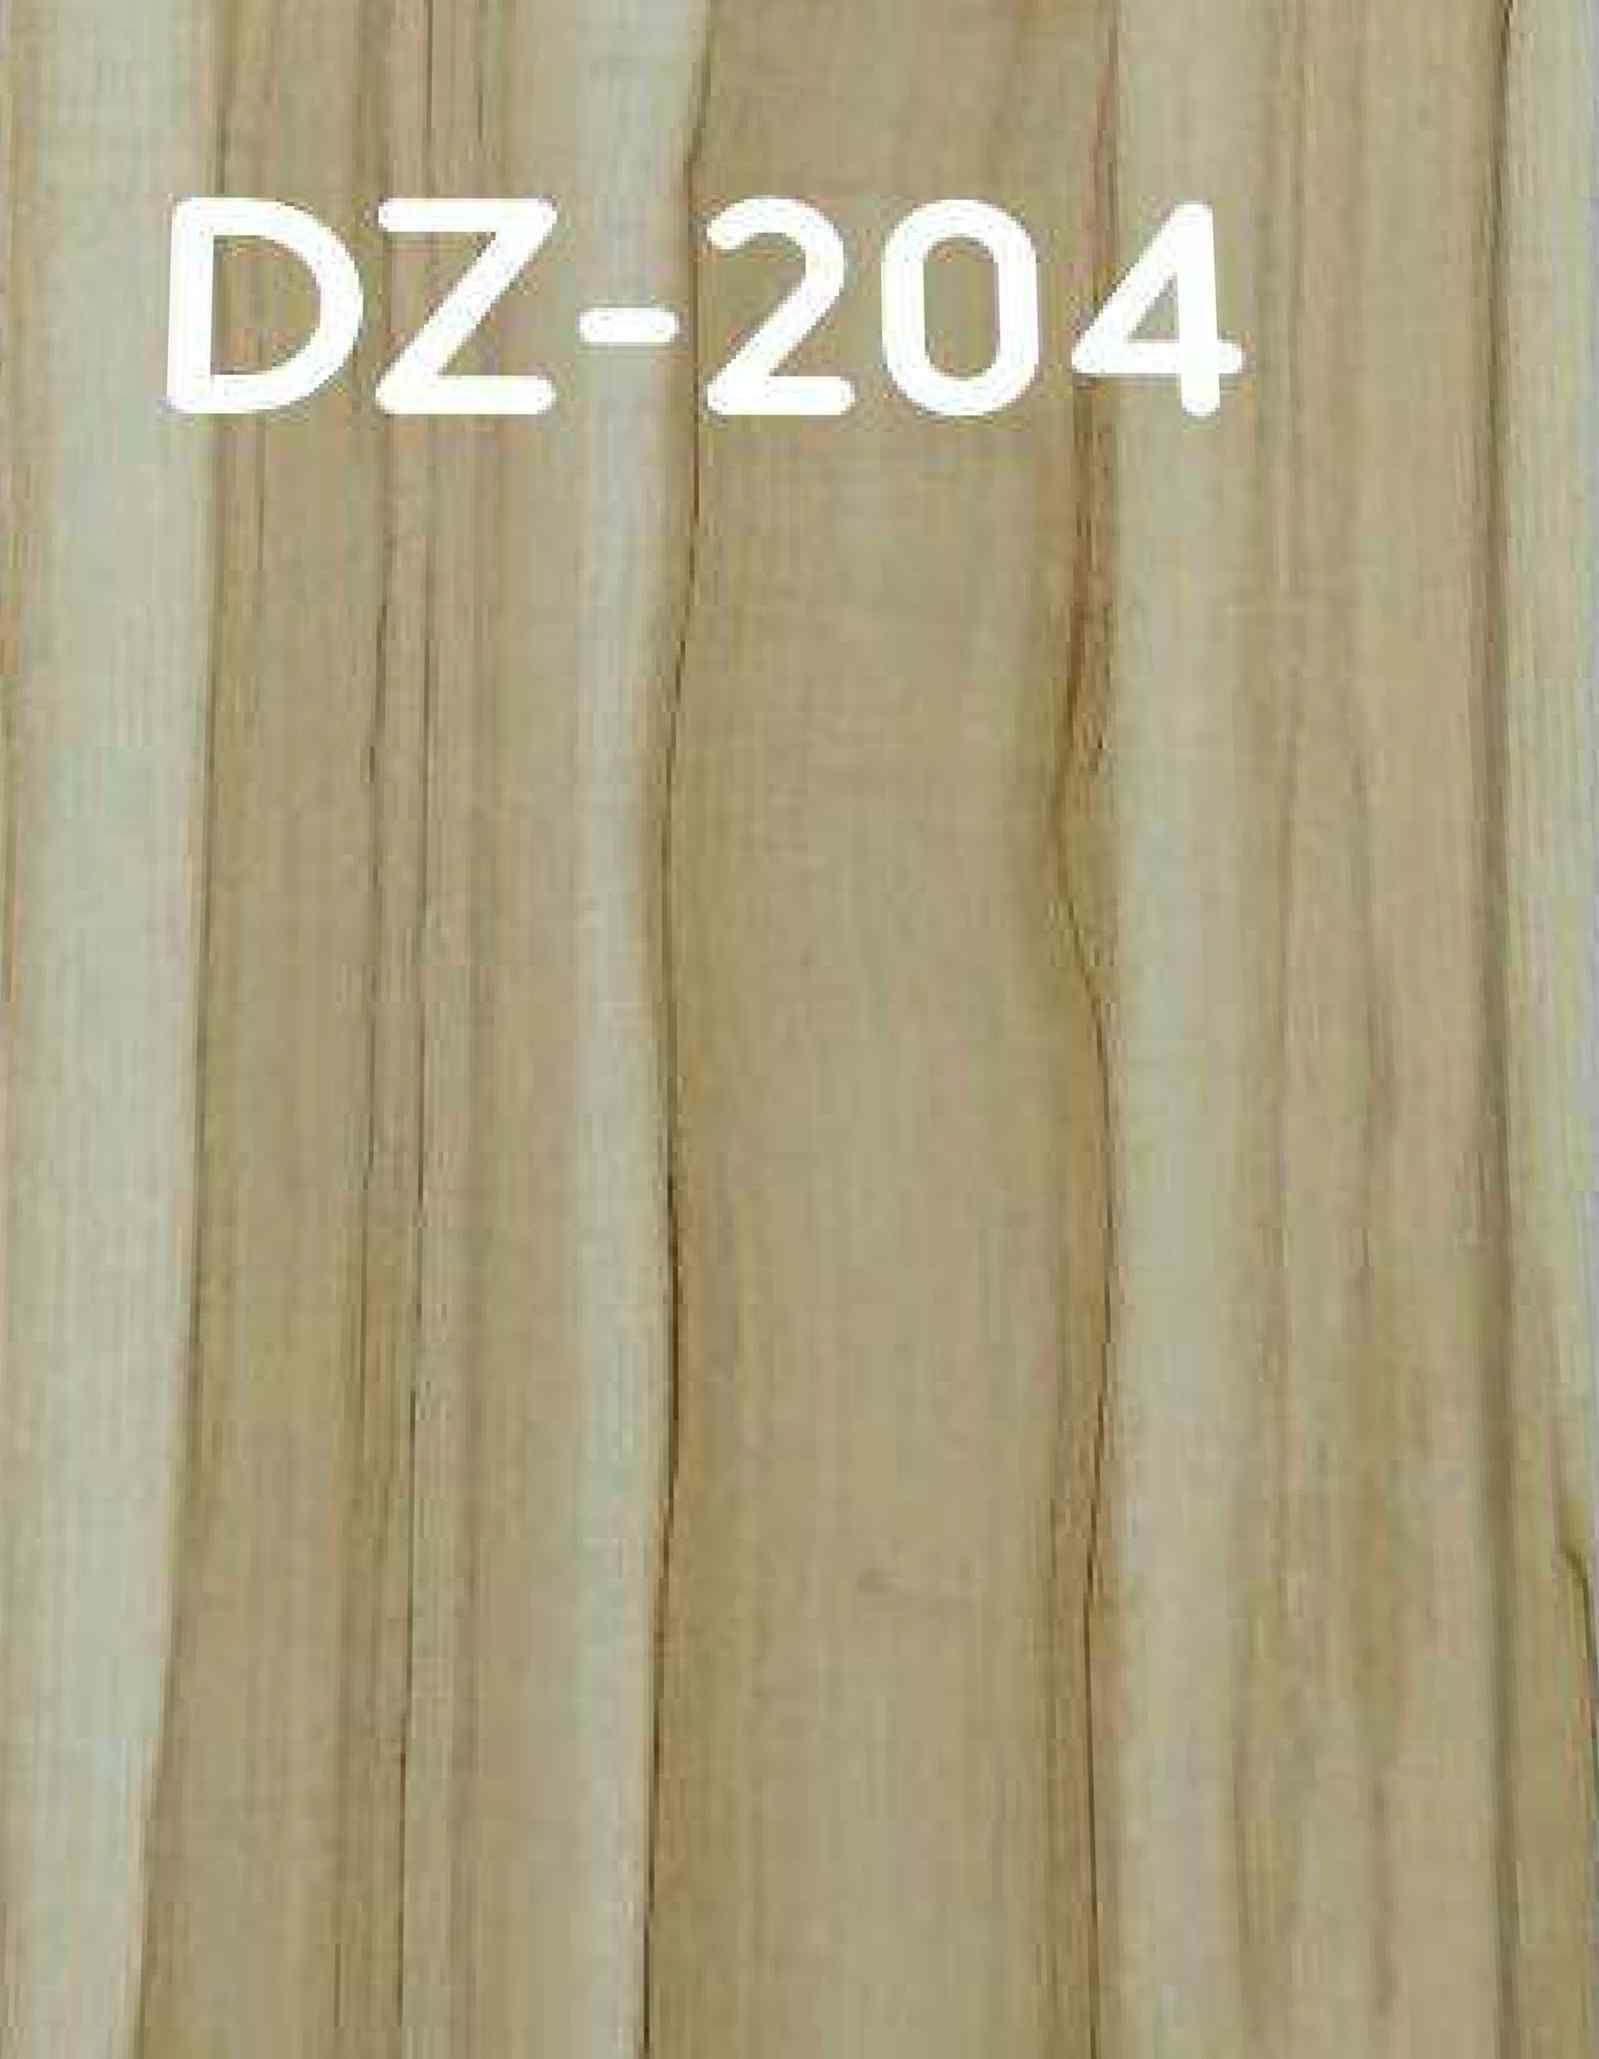 pvc panel - dz-204